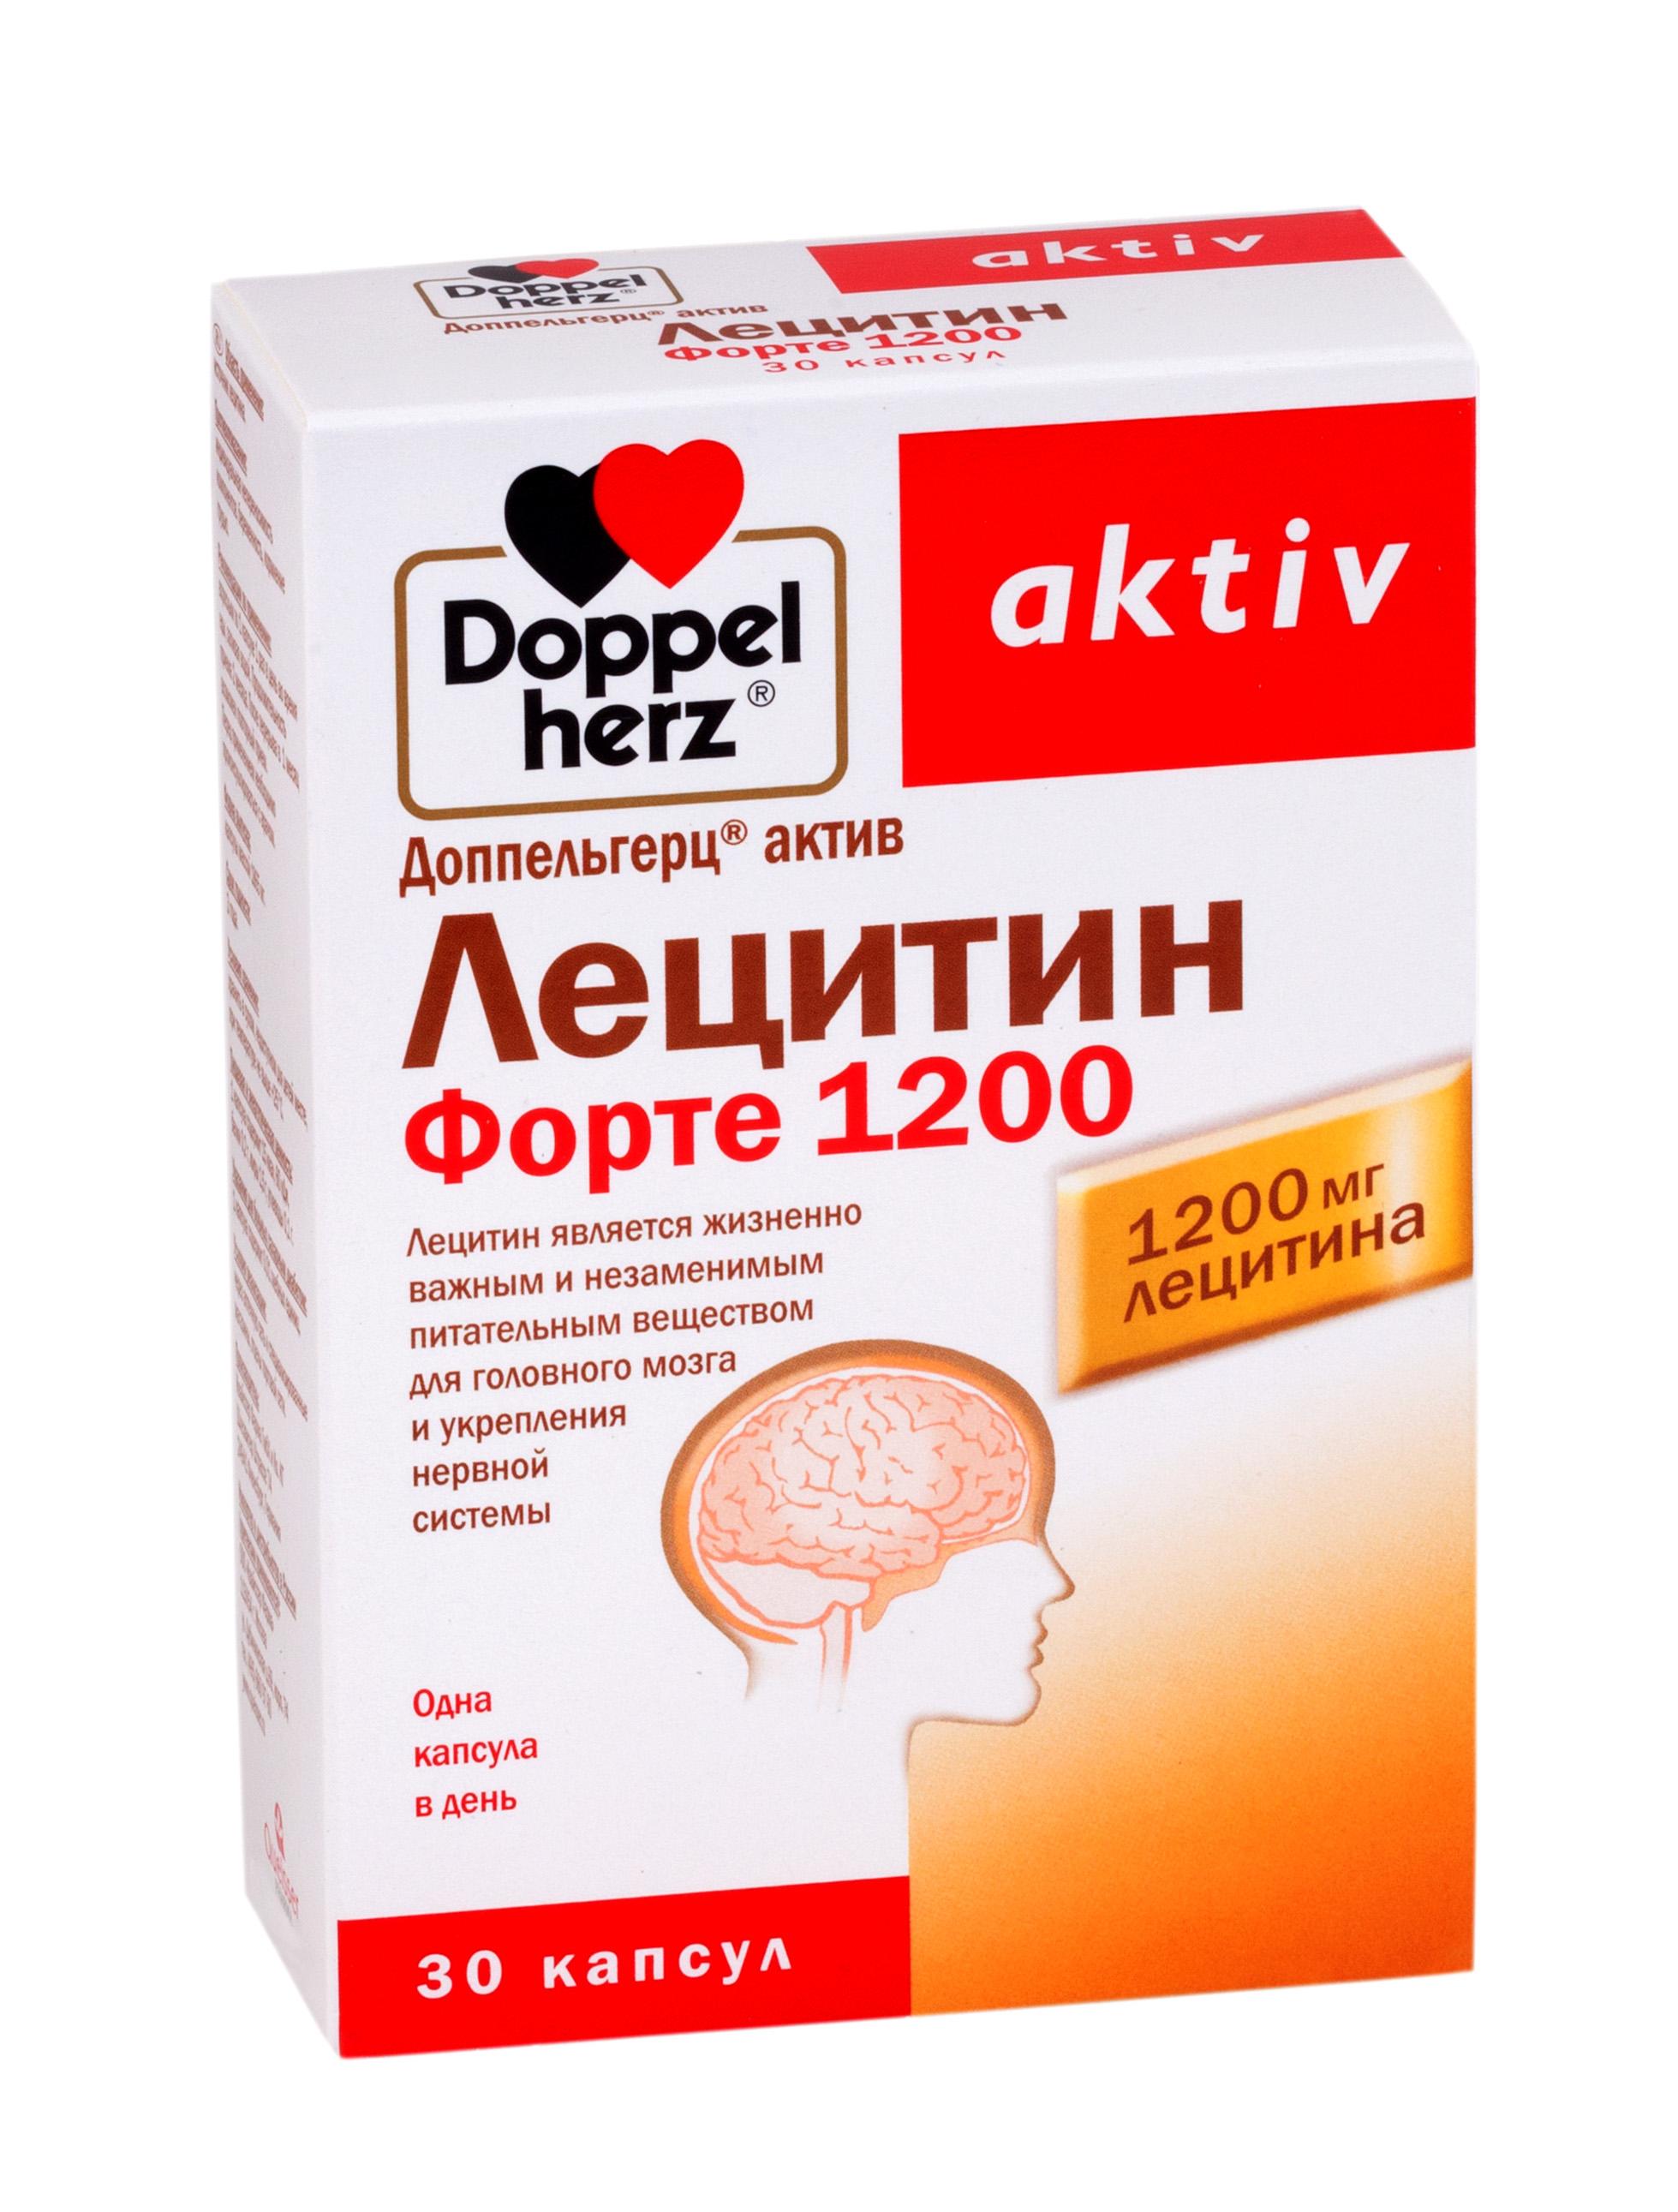 Доппельгерц актив лецитин форте 1200 капс. 1865 мг №30